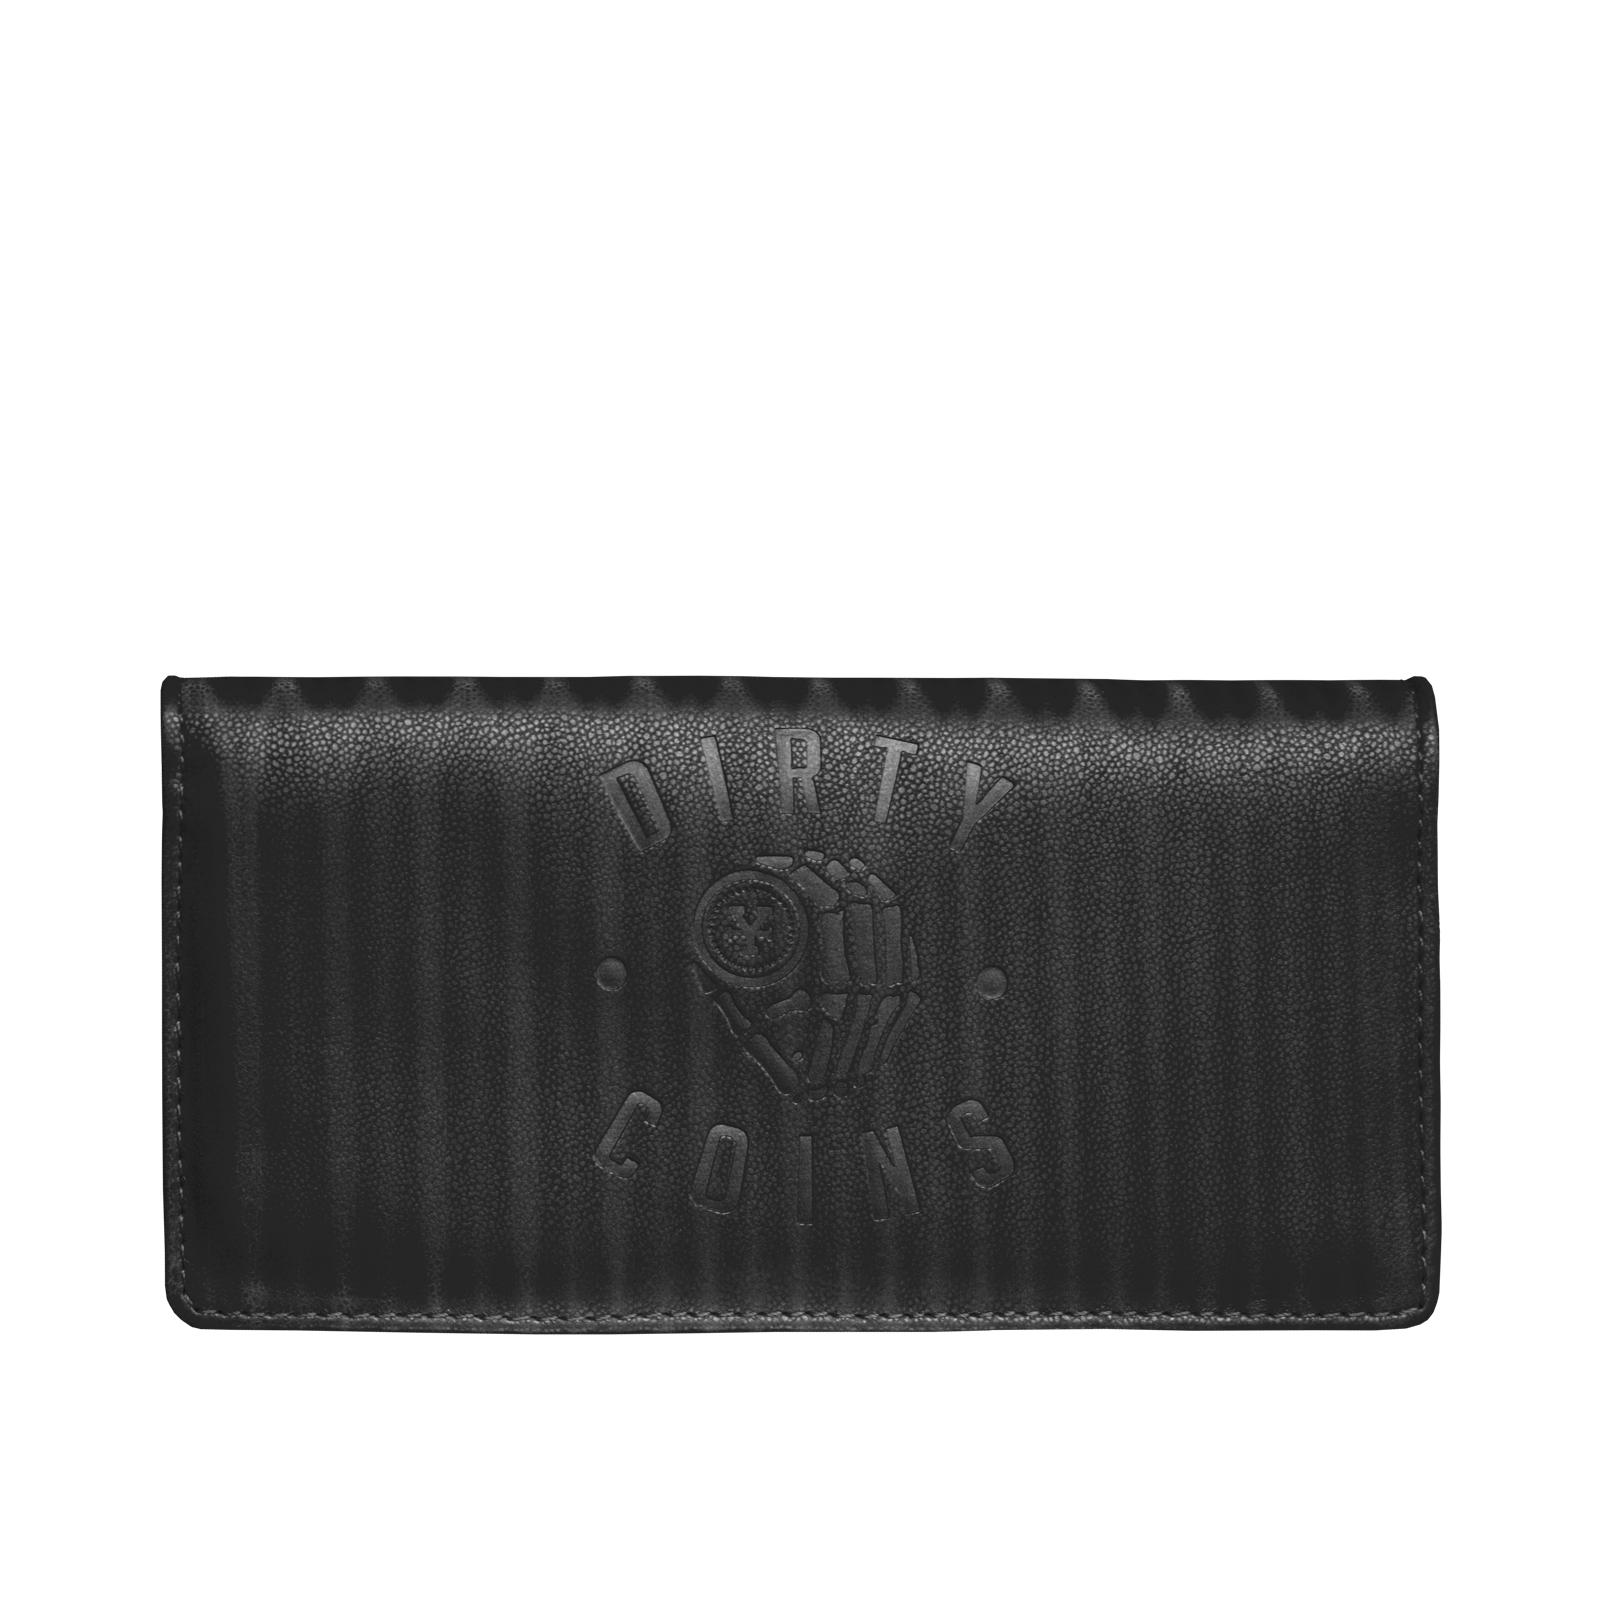 Crocs Long Wallet (3 phối màu)